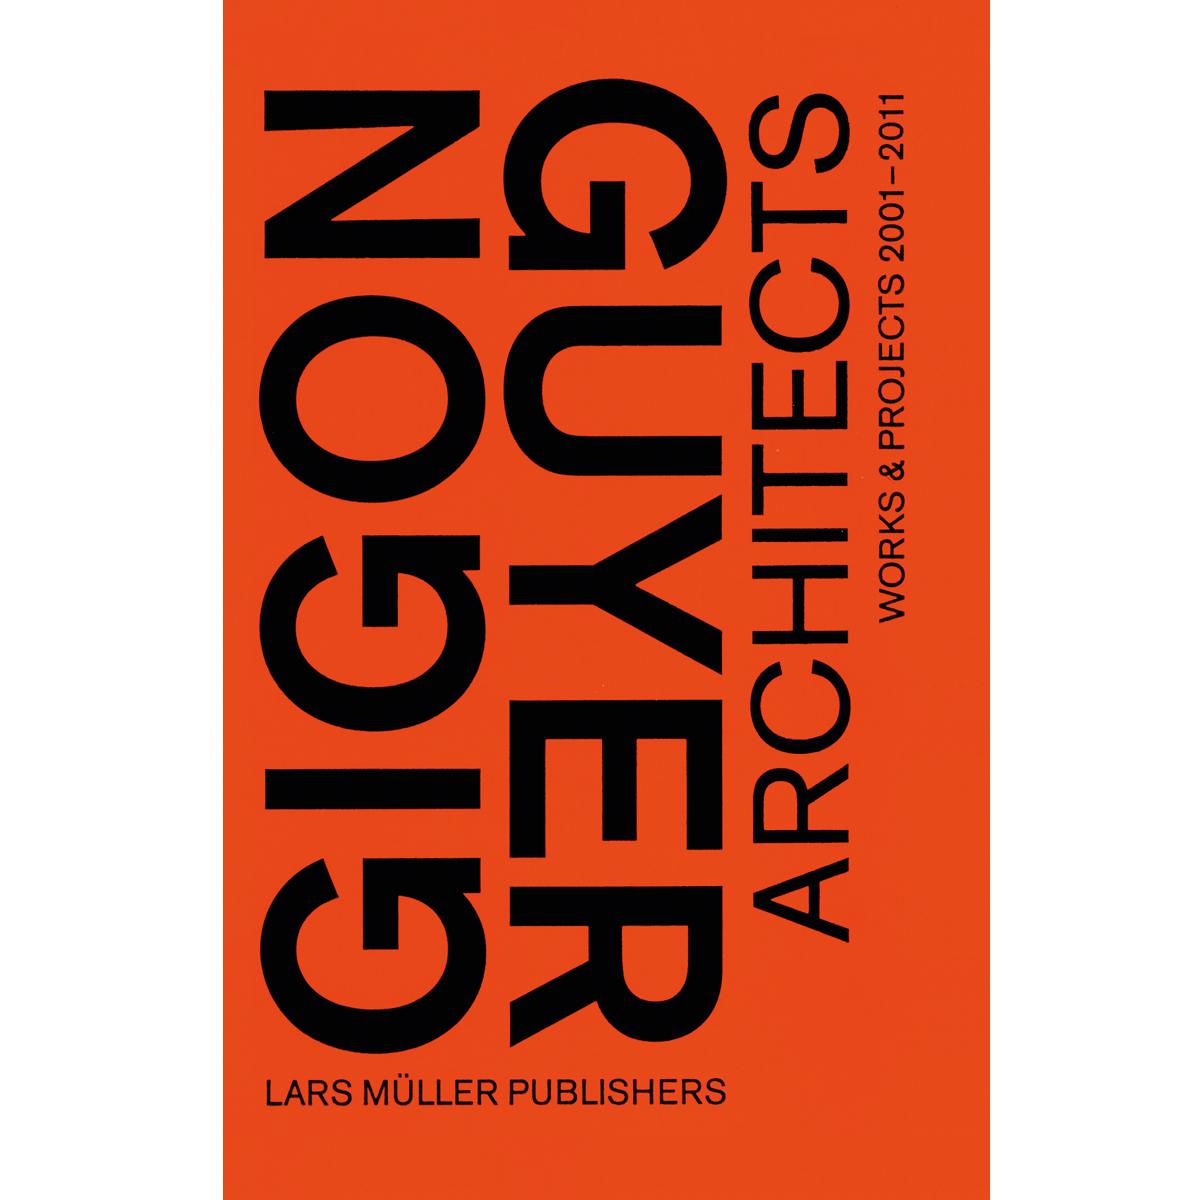 Gigon Guyer Architects